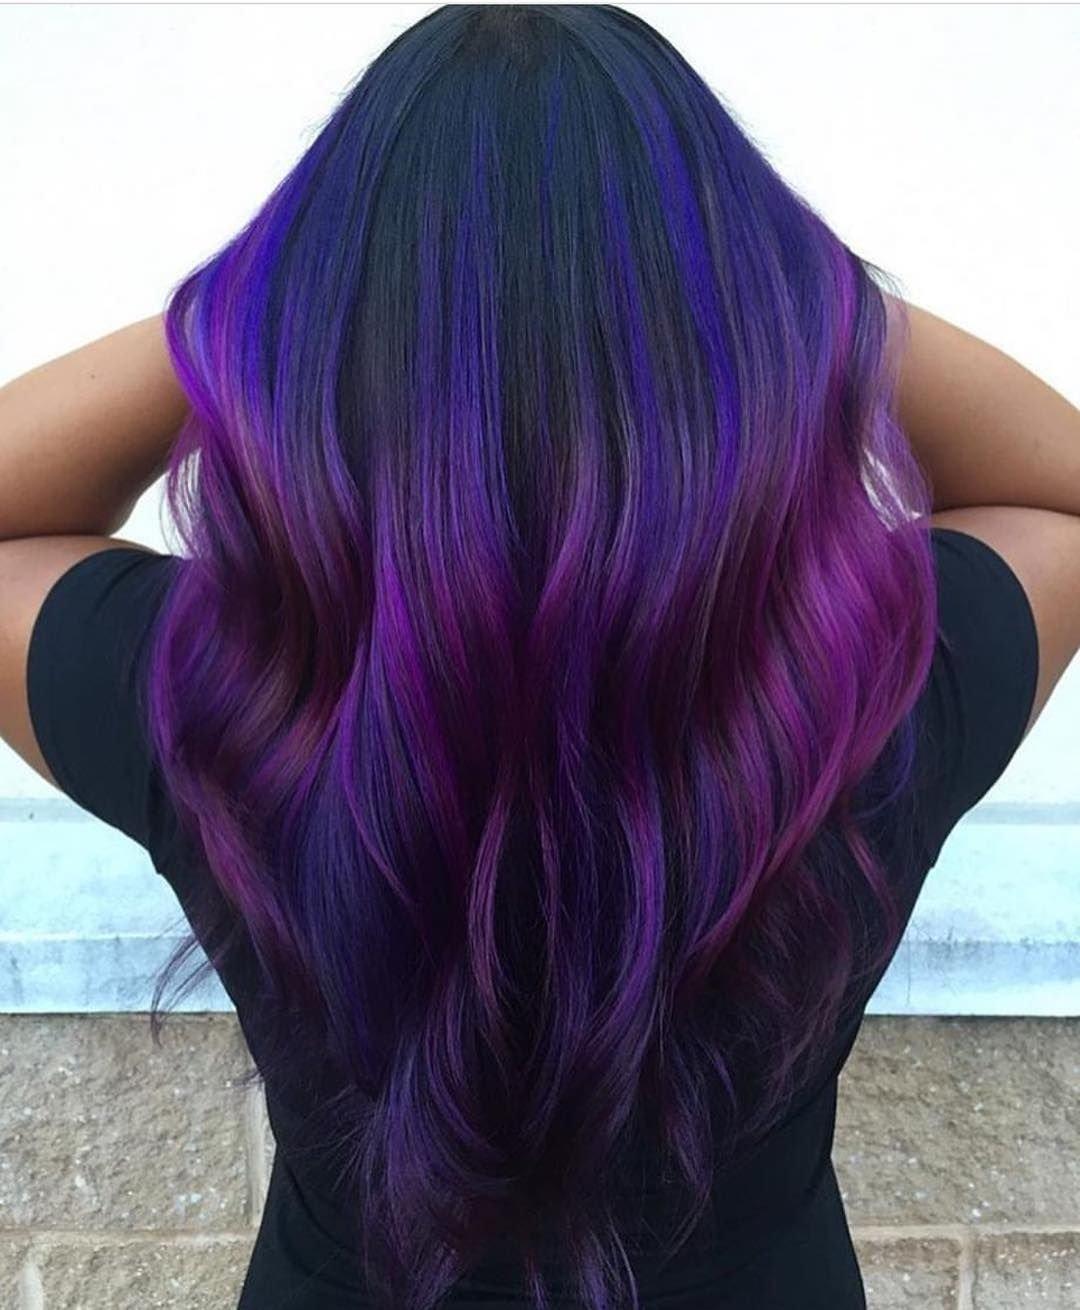 10 Wonderful Pink And Purple Hair Ideas 50 glamorous dark purple hair color ideas destined to mesmerize 2020